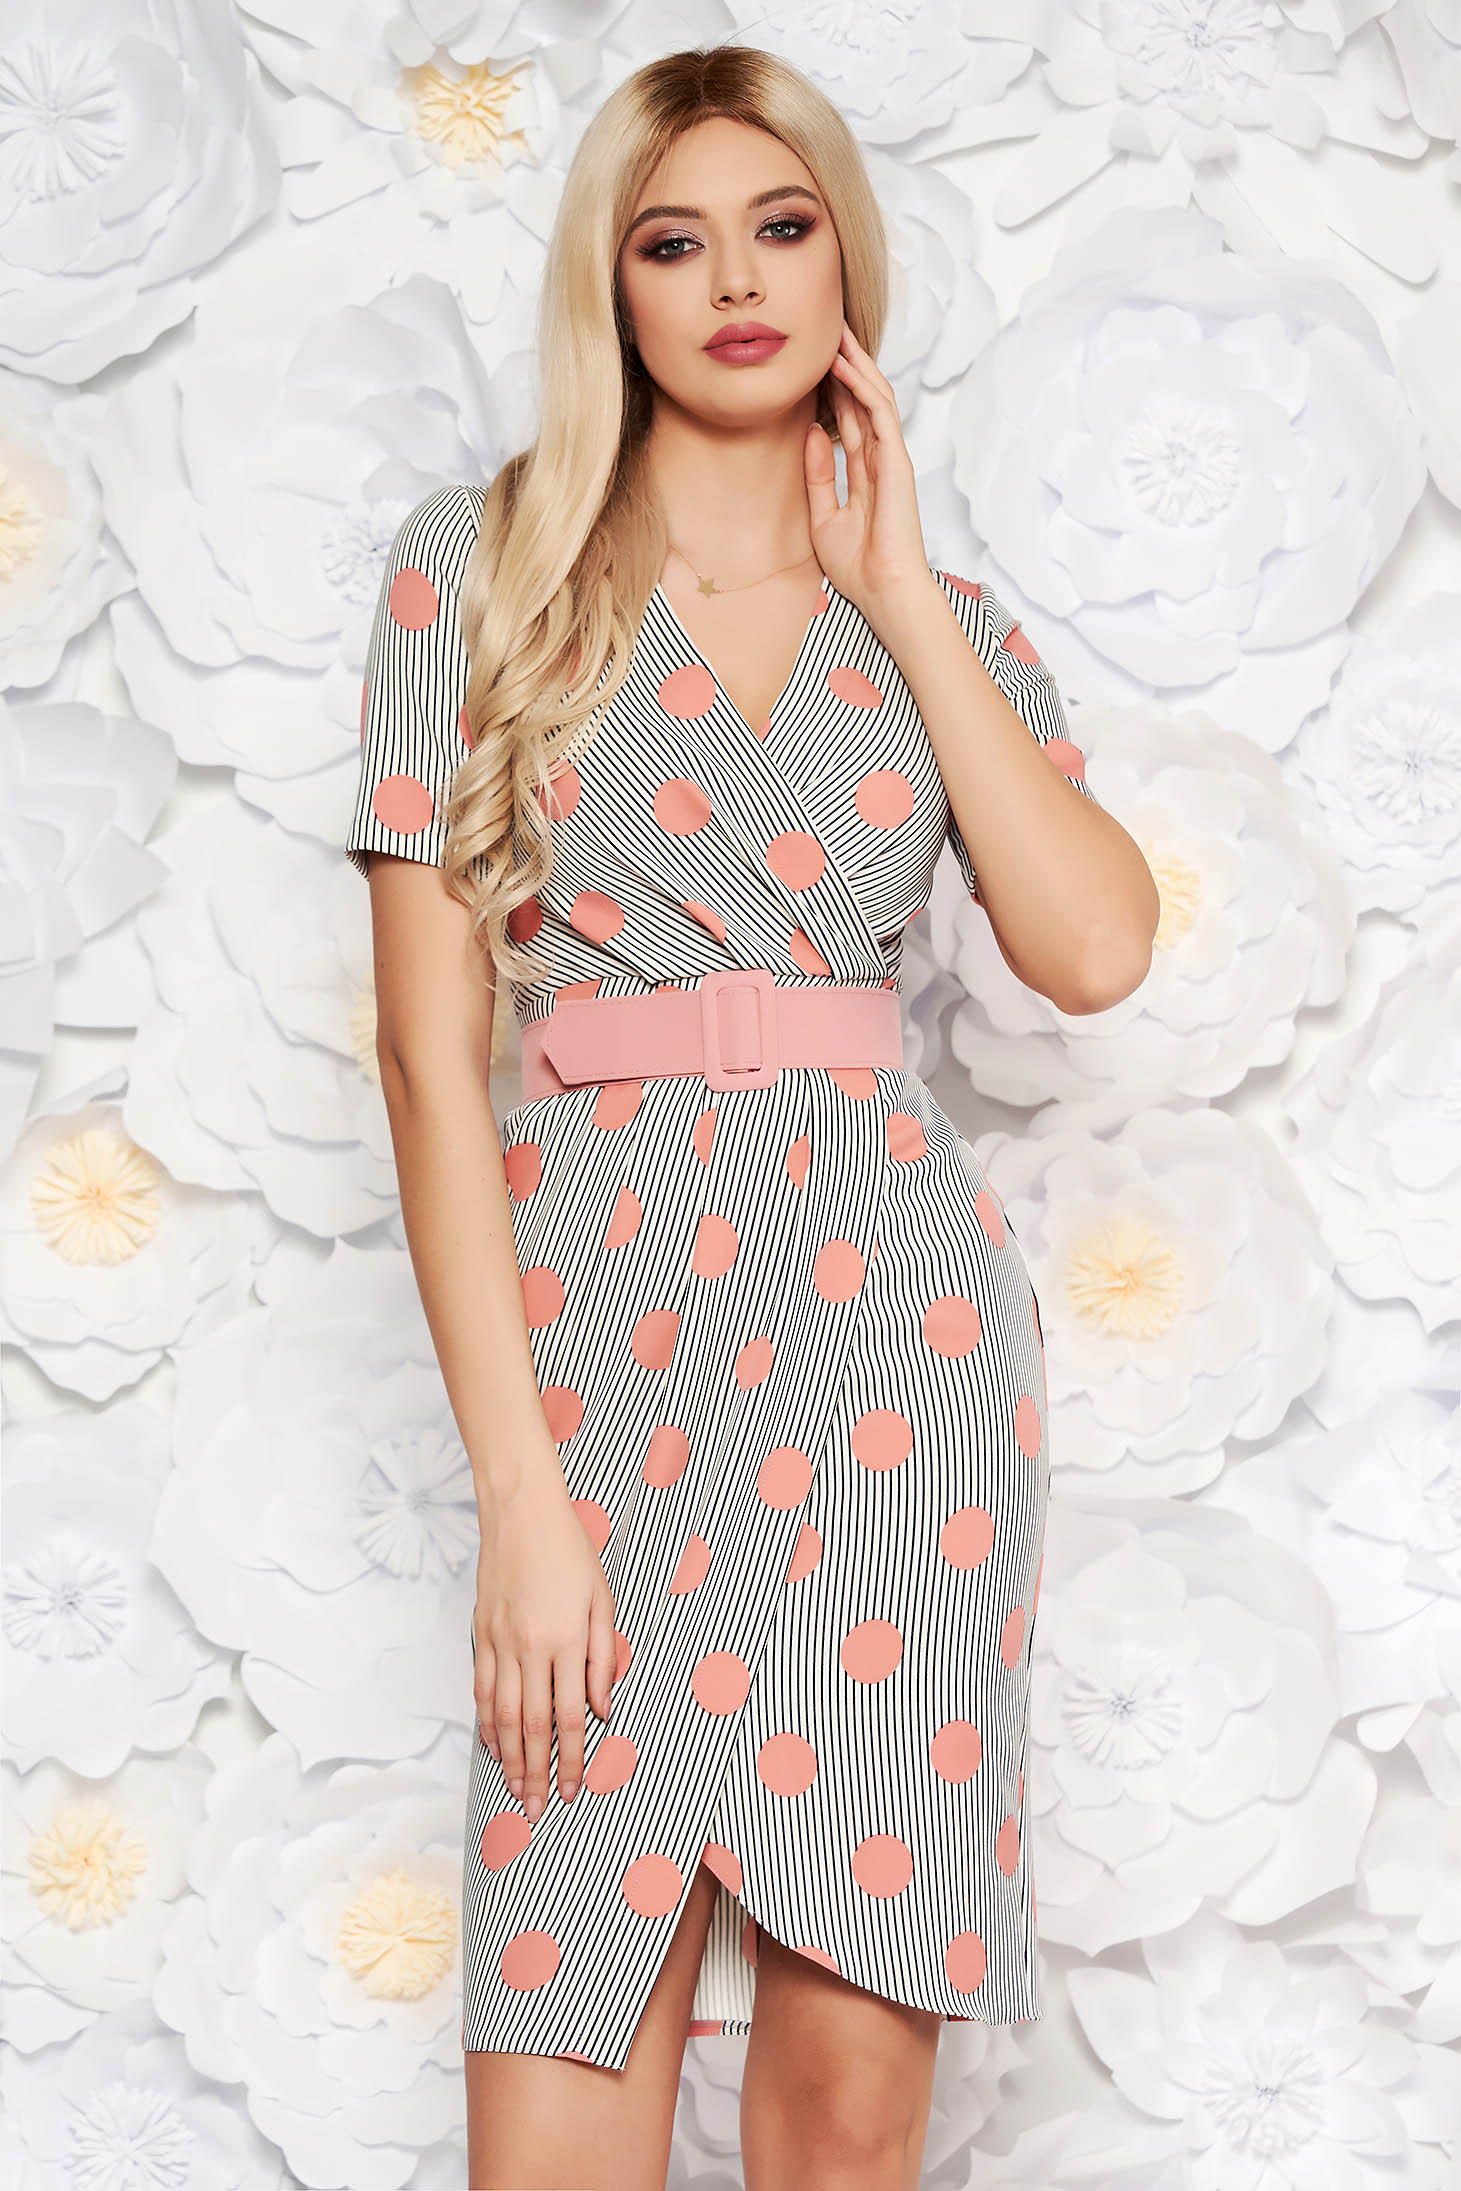 PrettyGirl rosa office midi pencil dress soft fabric accessorized with belt